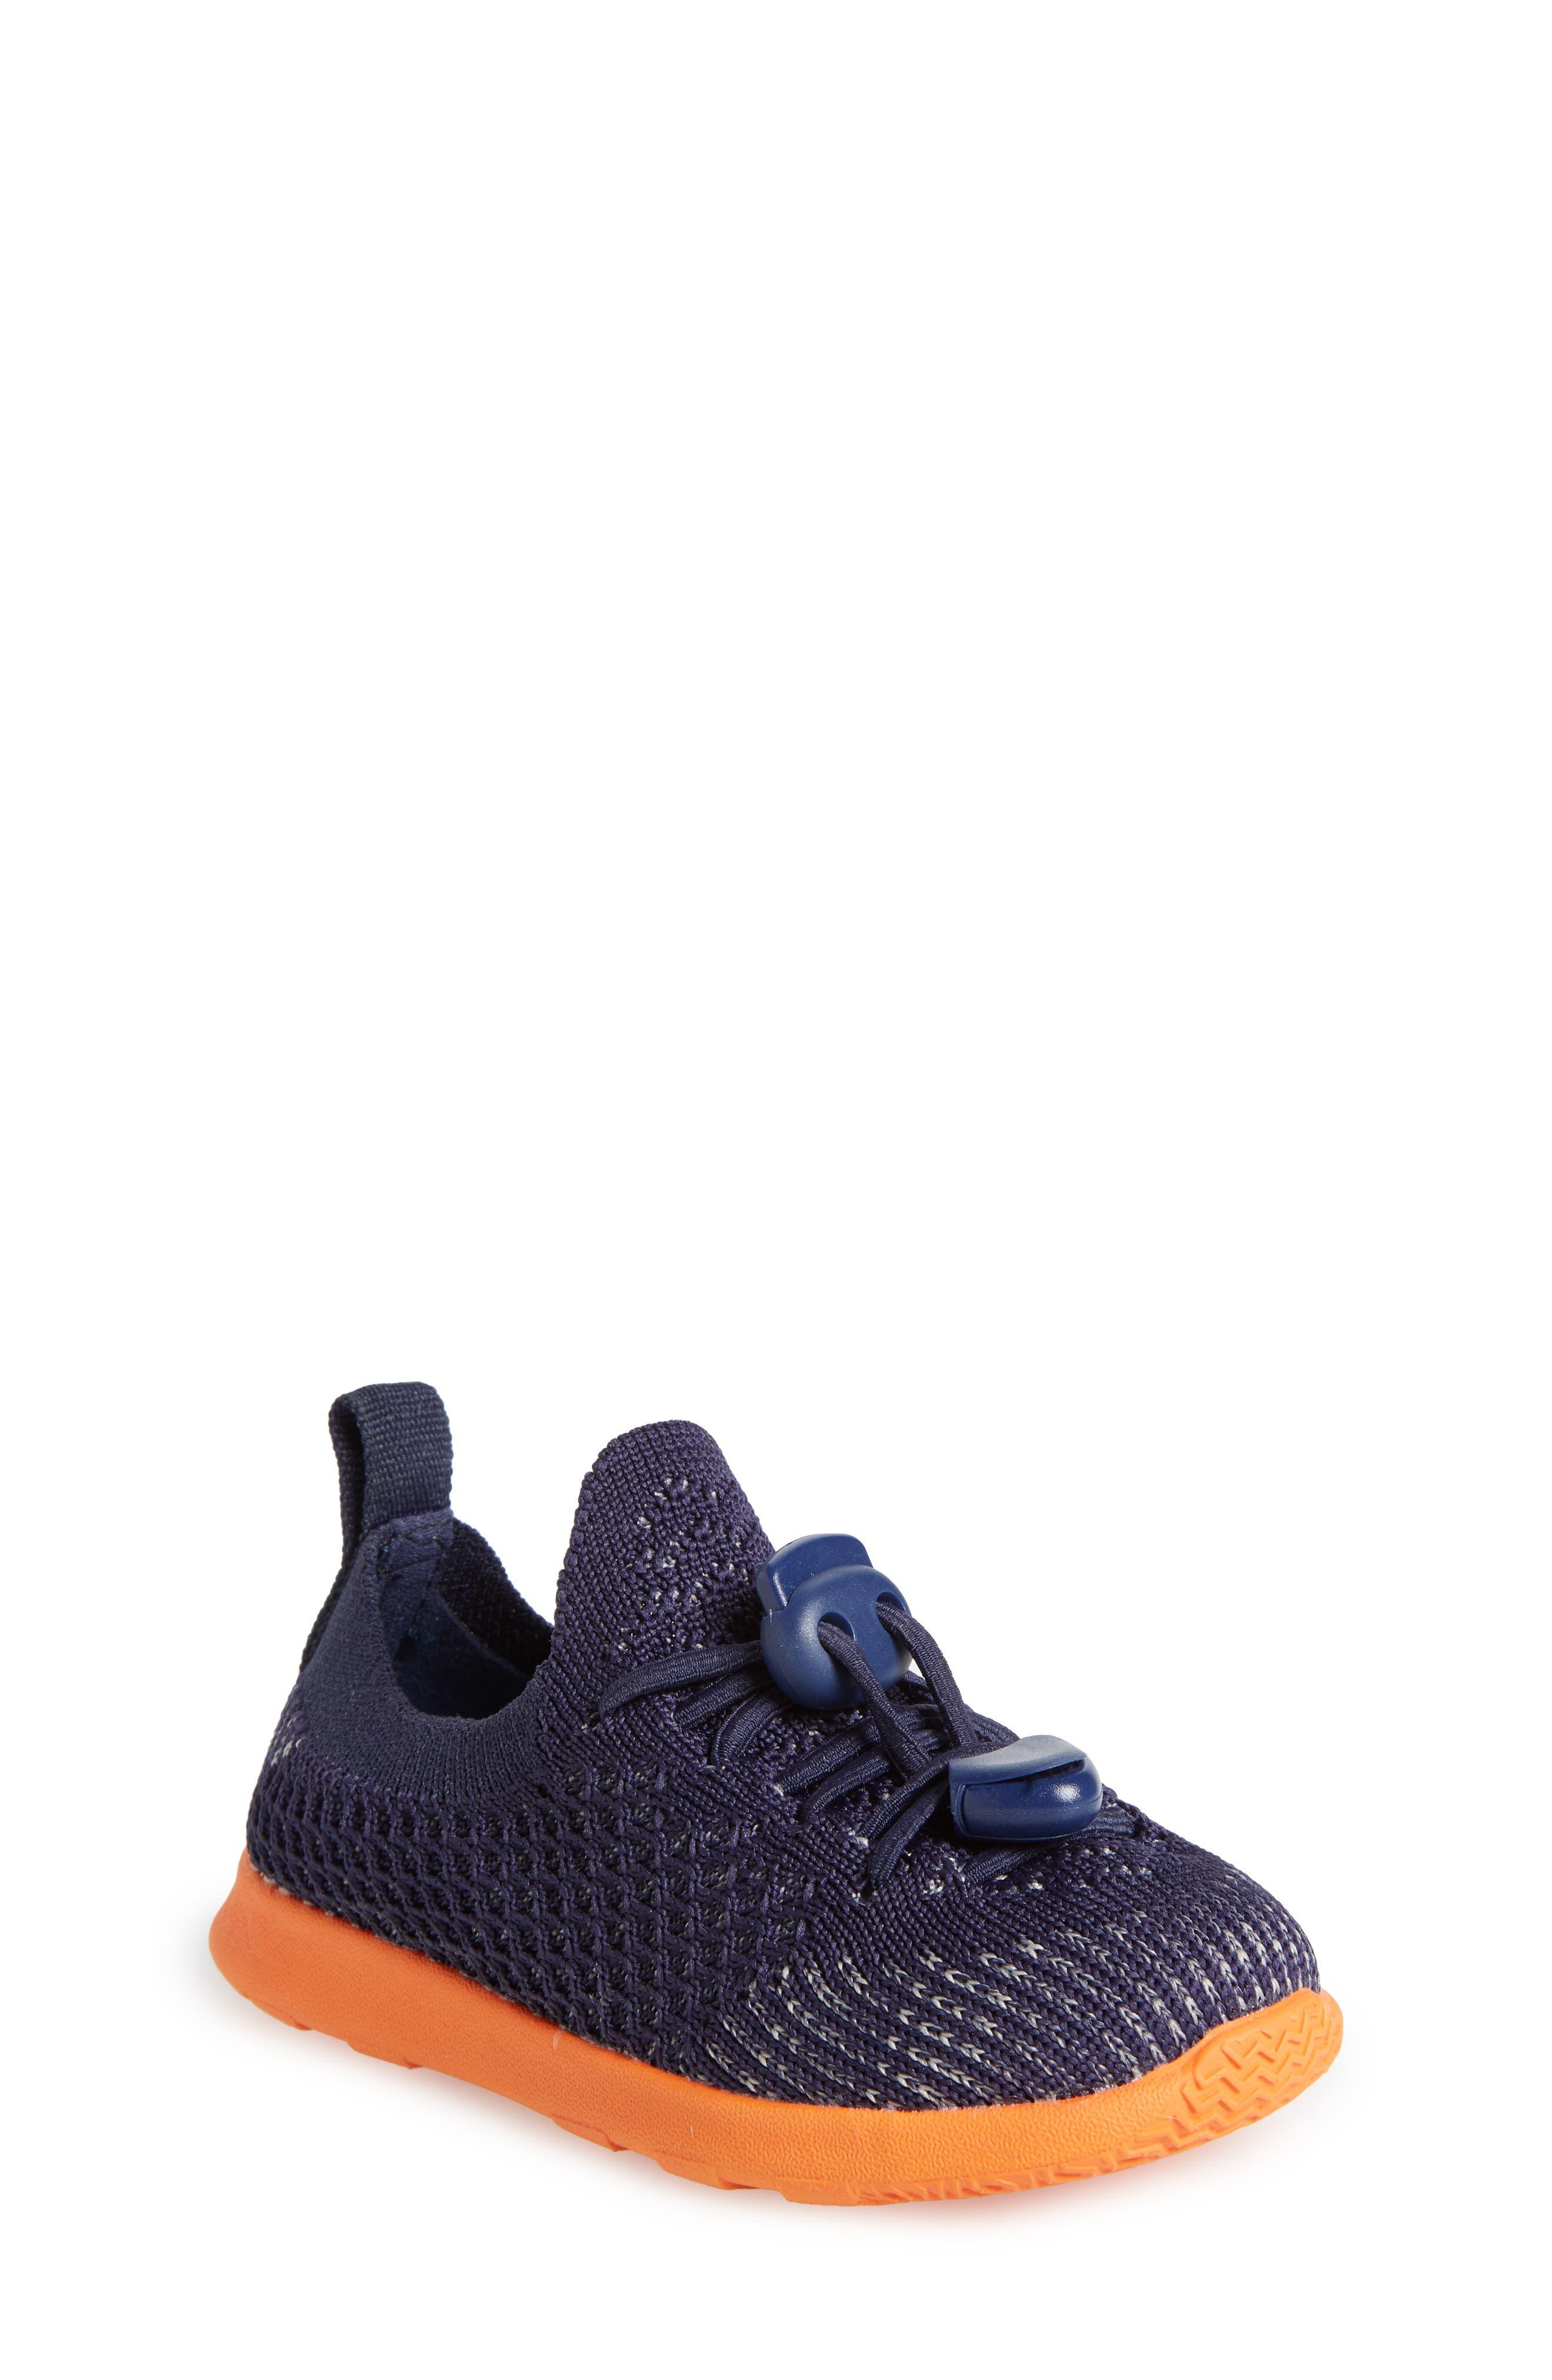 AP Mercury LiteKnit Sneaker,                         Main,                         color, REGATTA BLUE/ SUNSET ORANGE